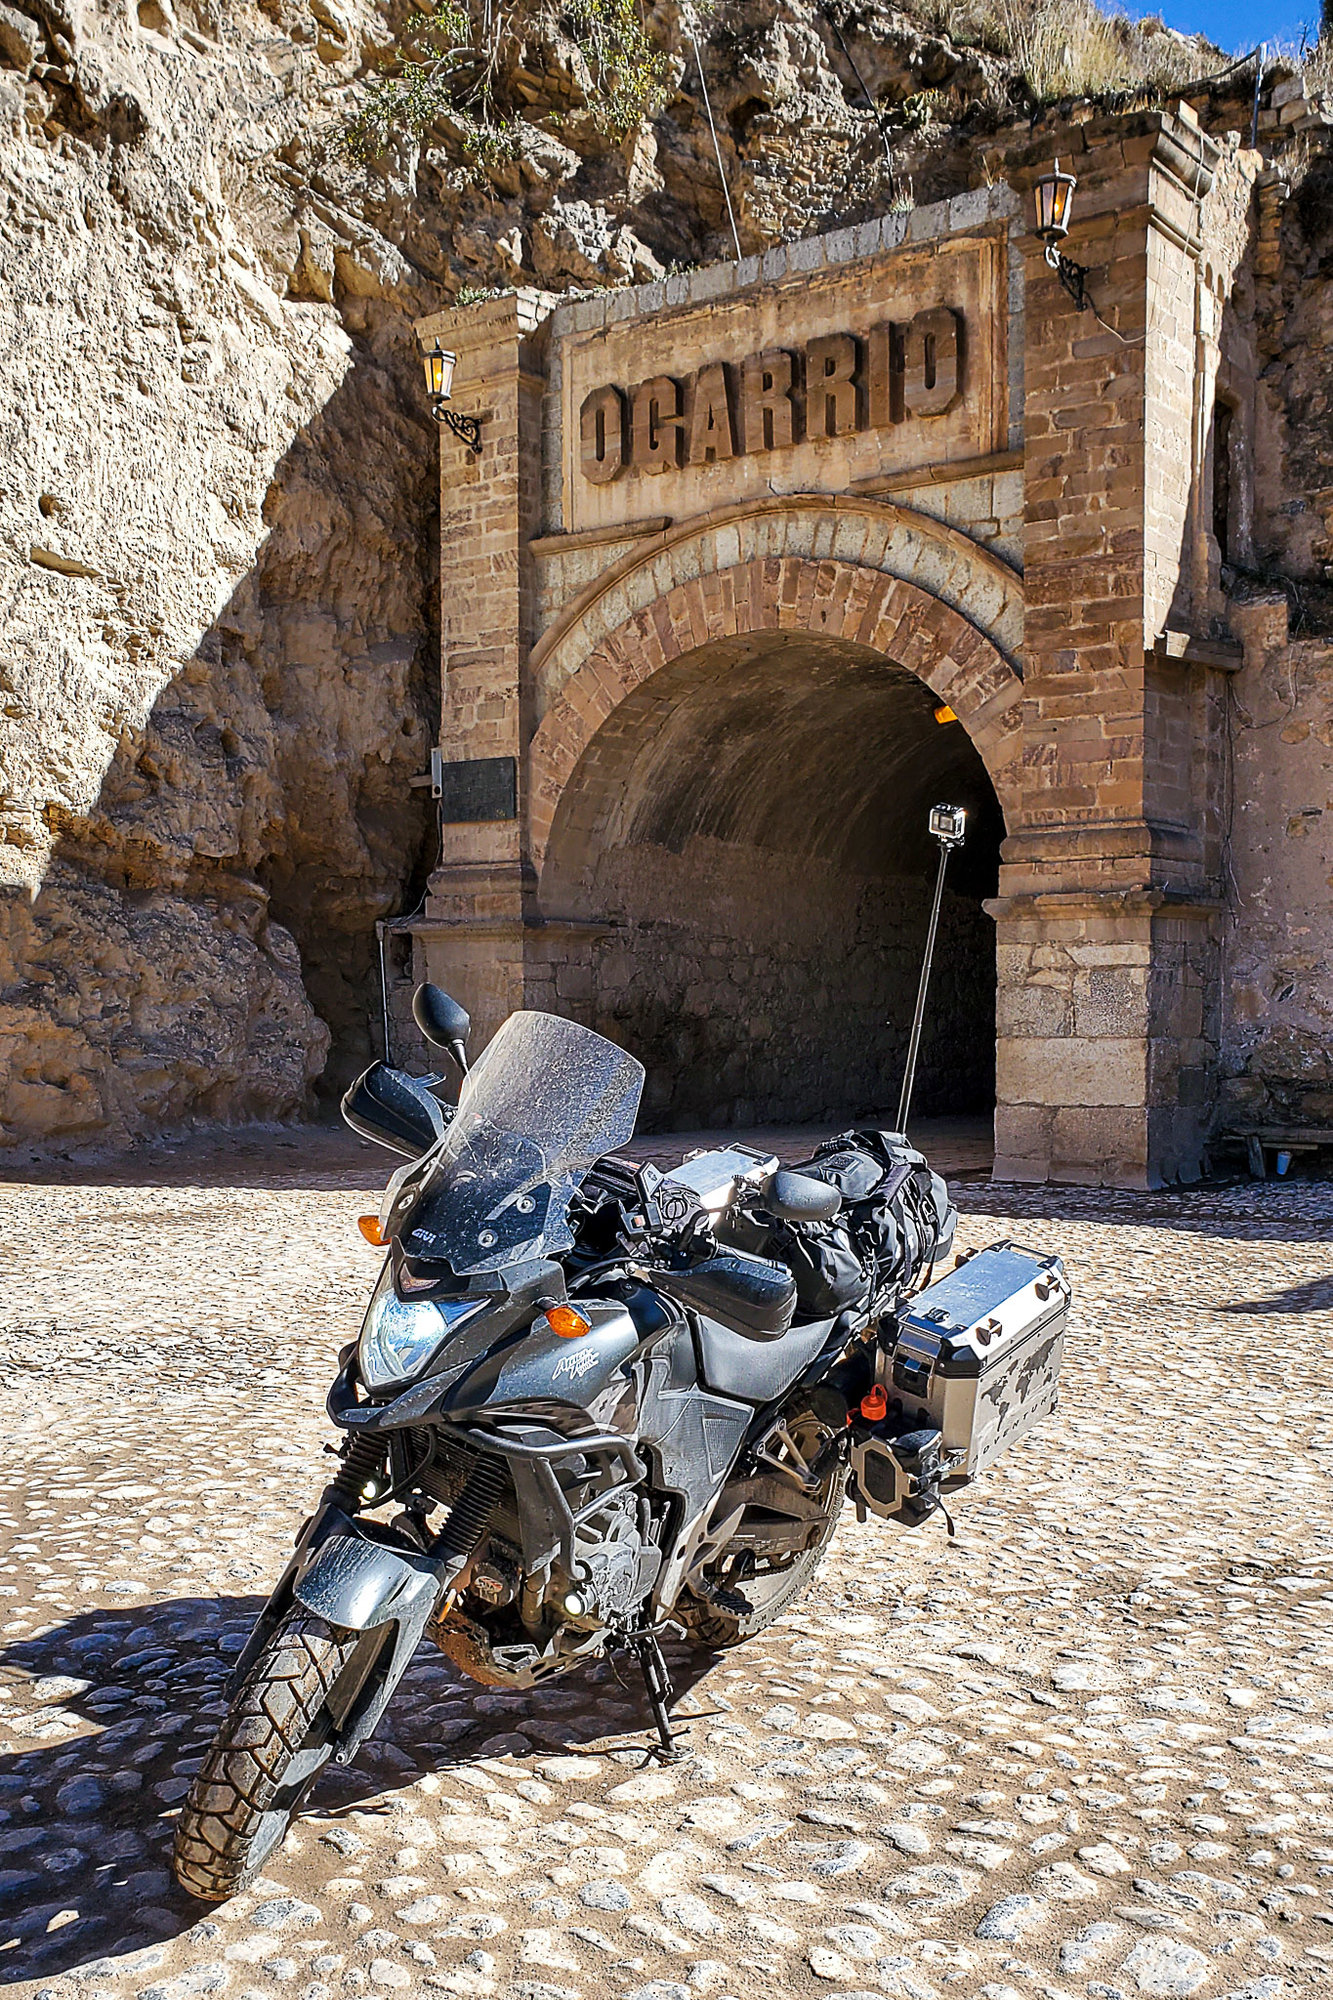 200114-Moto-Photo-Mexico-0498.jpg